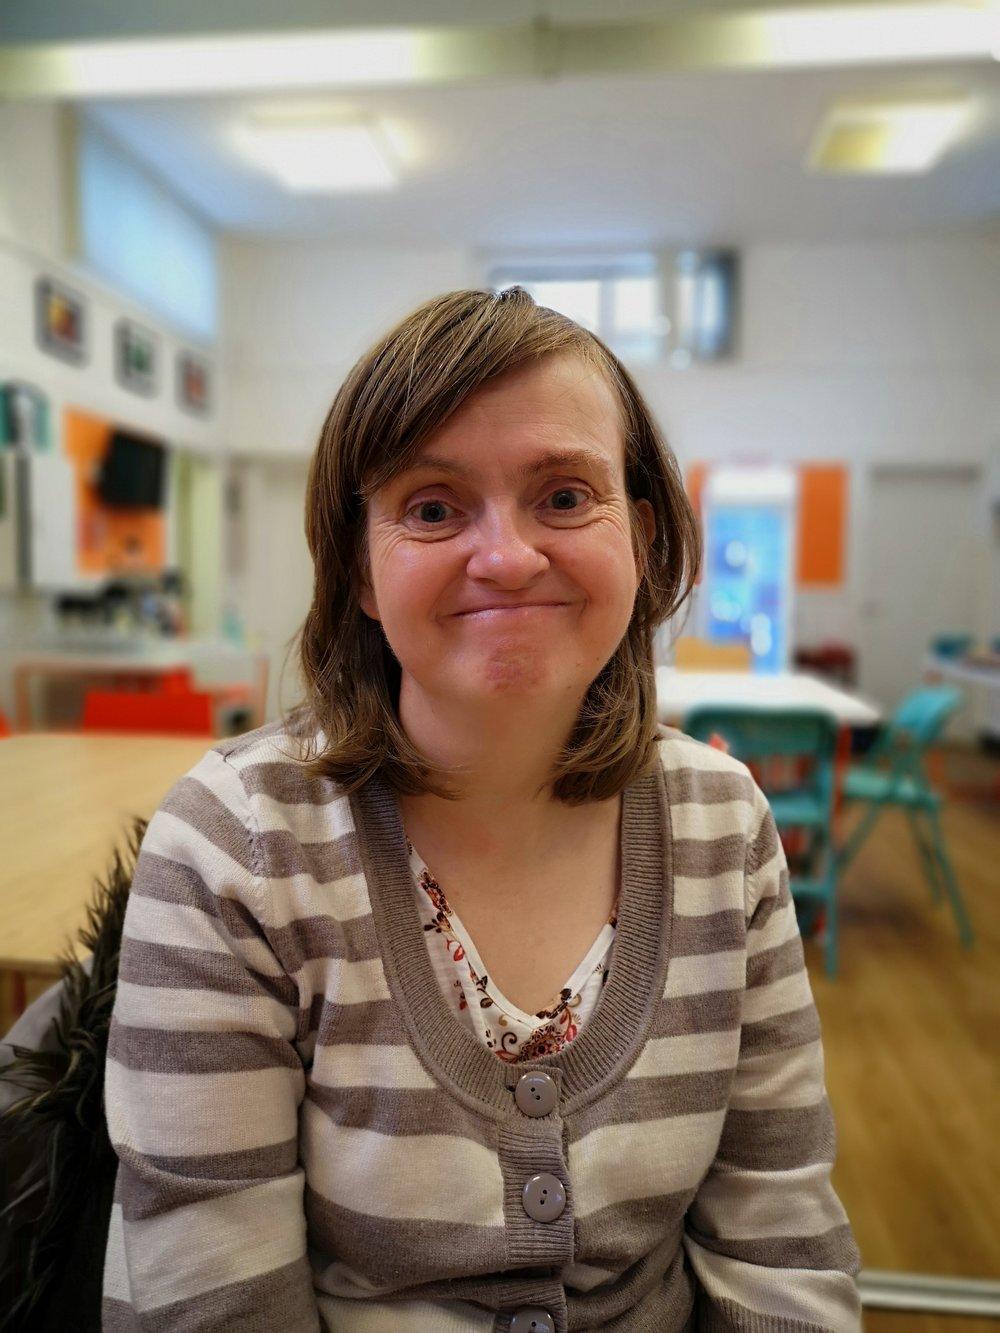 Debbie our volunteer parent rep